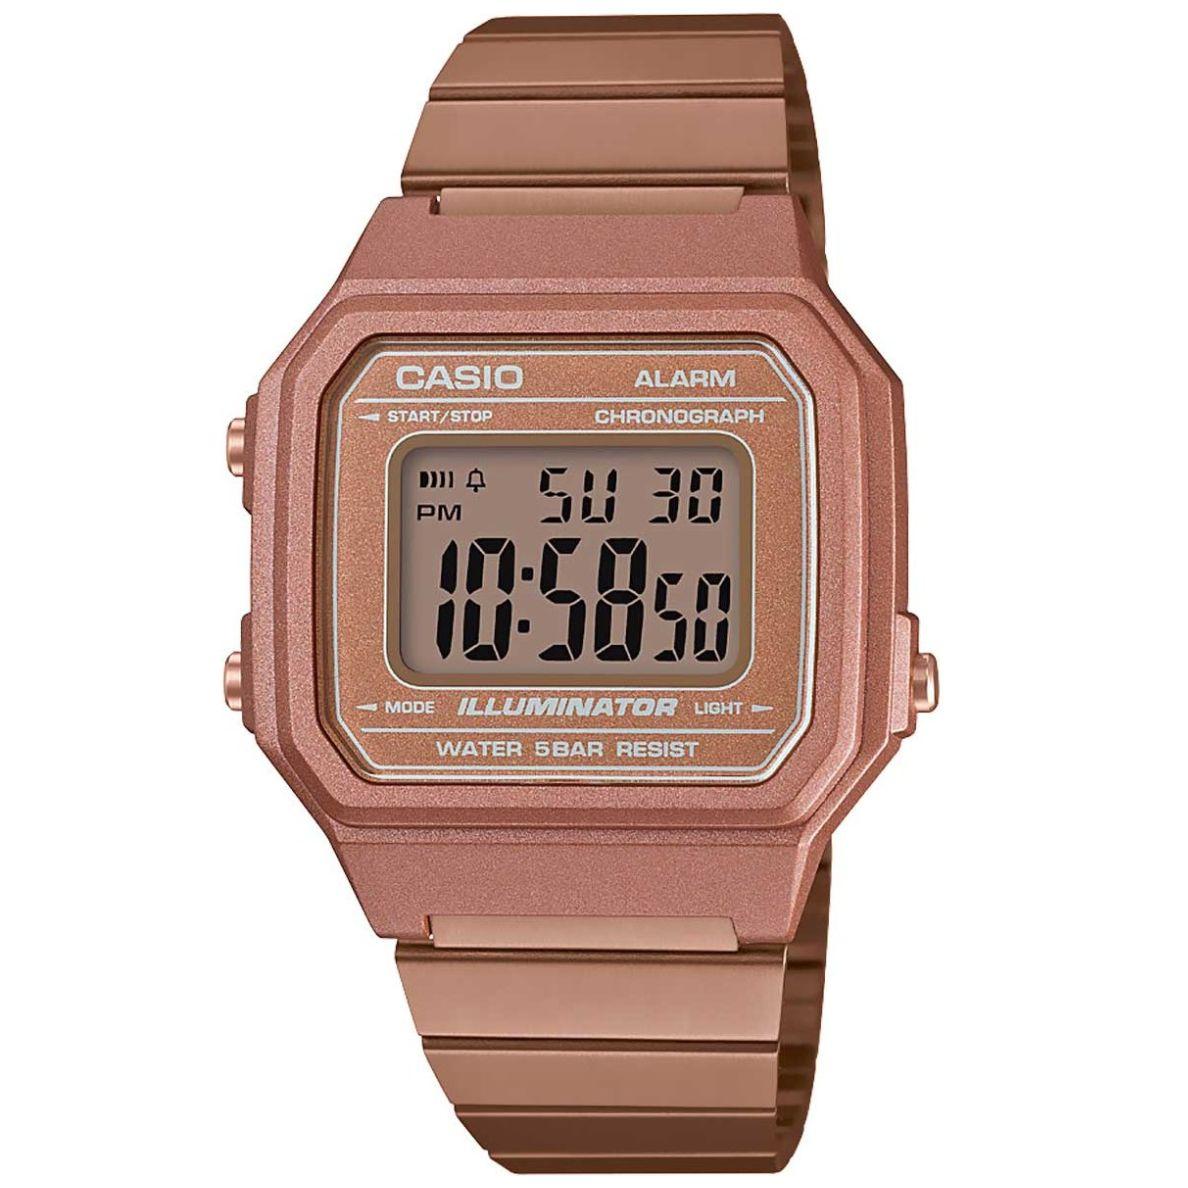 04dcec711094 Reloj Unisex Vintage Casio B650WC-5AVT